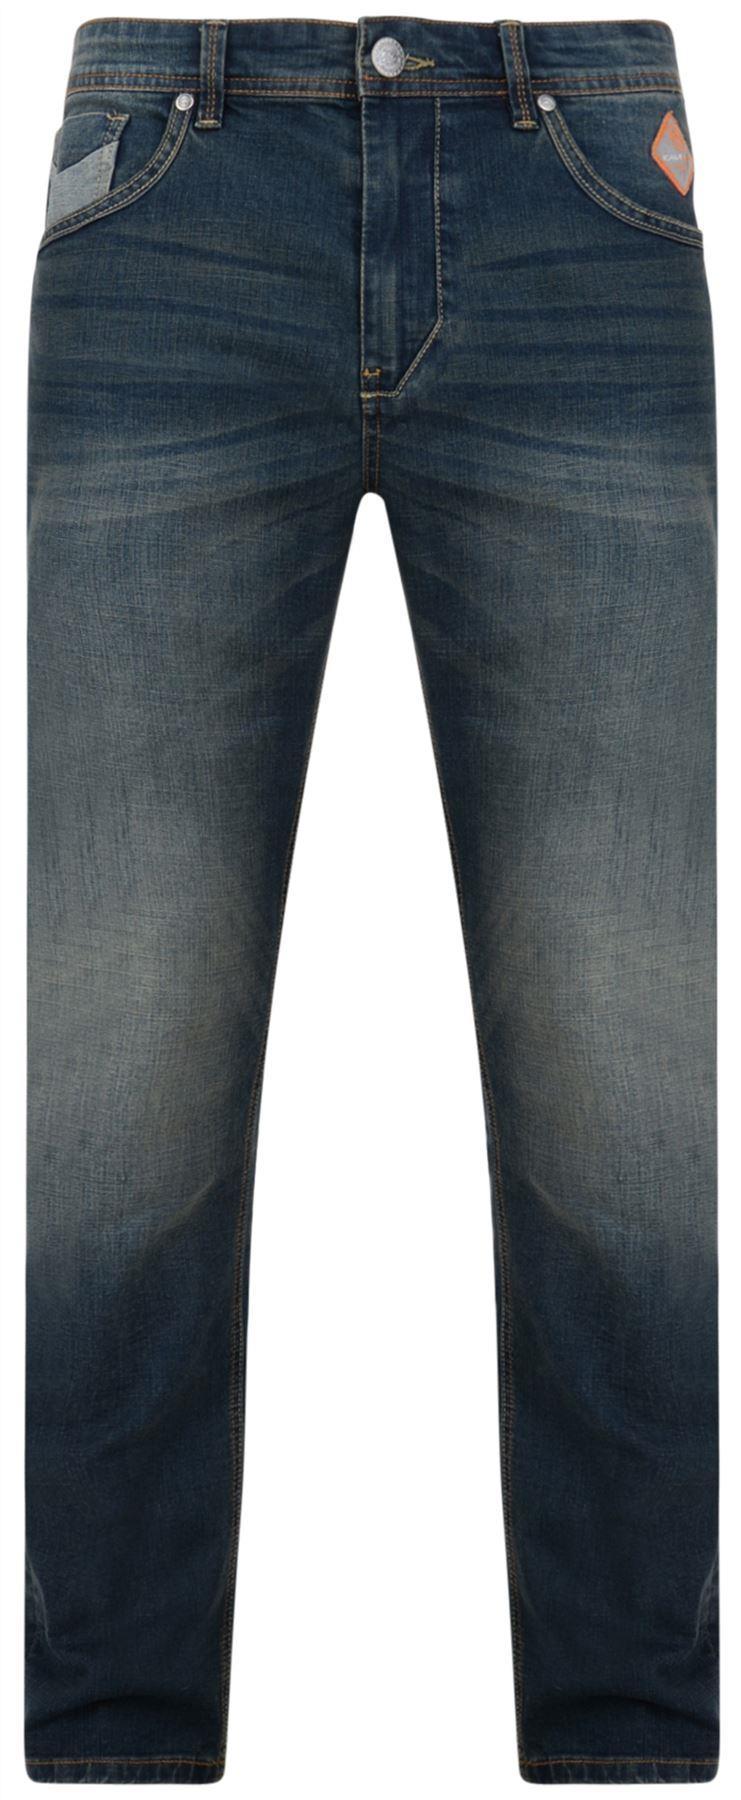 0ea688d8 Kam Ruben Tall Fit Jeans - Blue|66 68 70 72 Inch Big Clothing 4 U